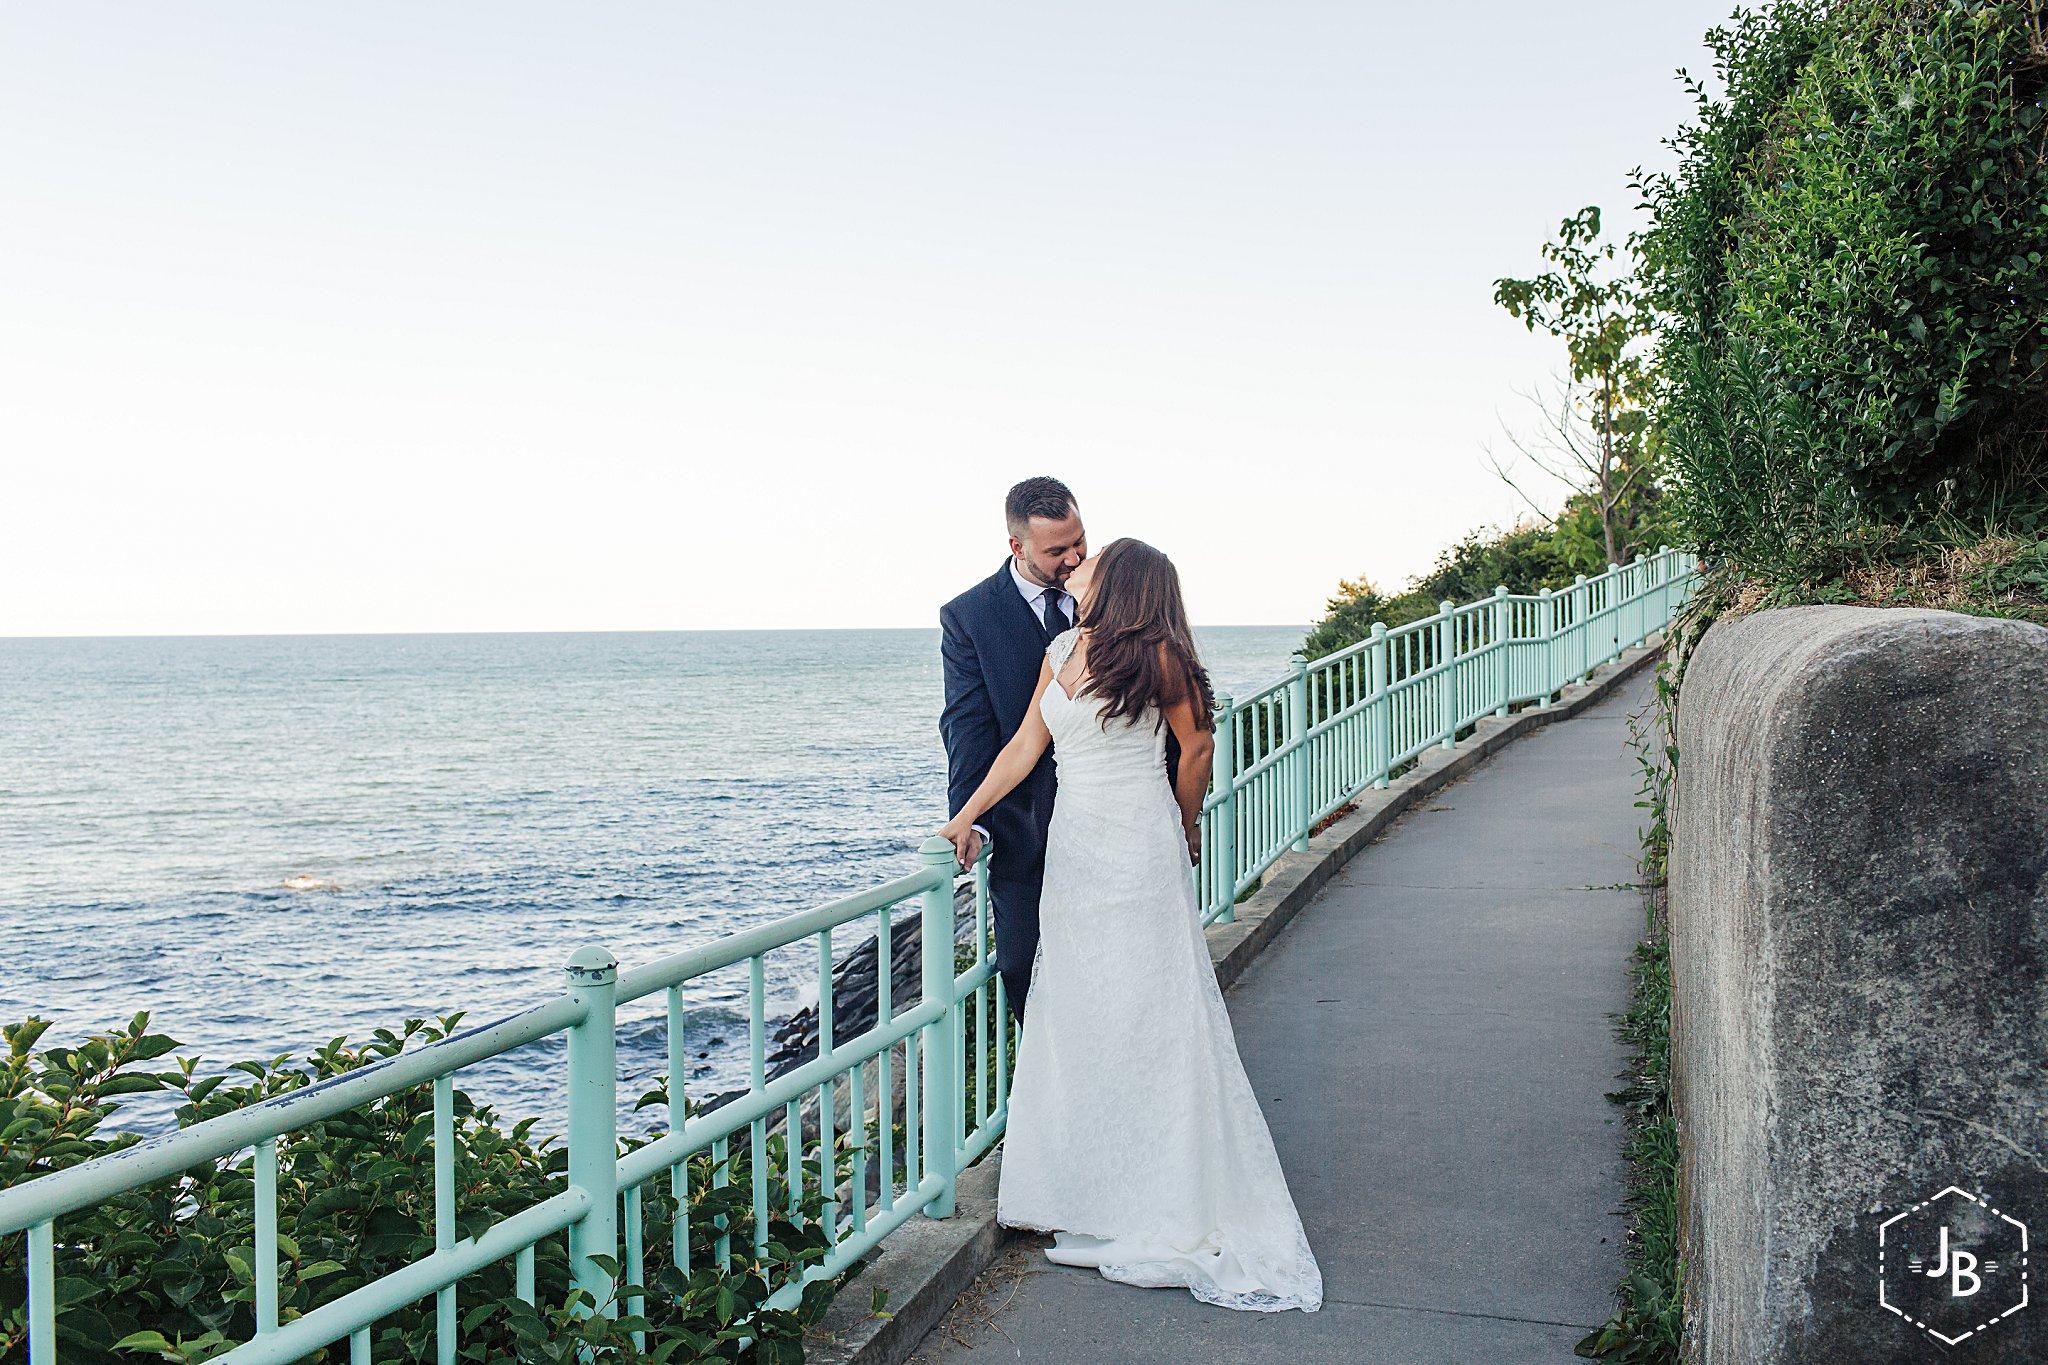 WeddingandEngagementFloridaPhotographer_2921.jpg